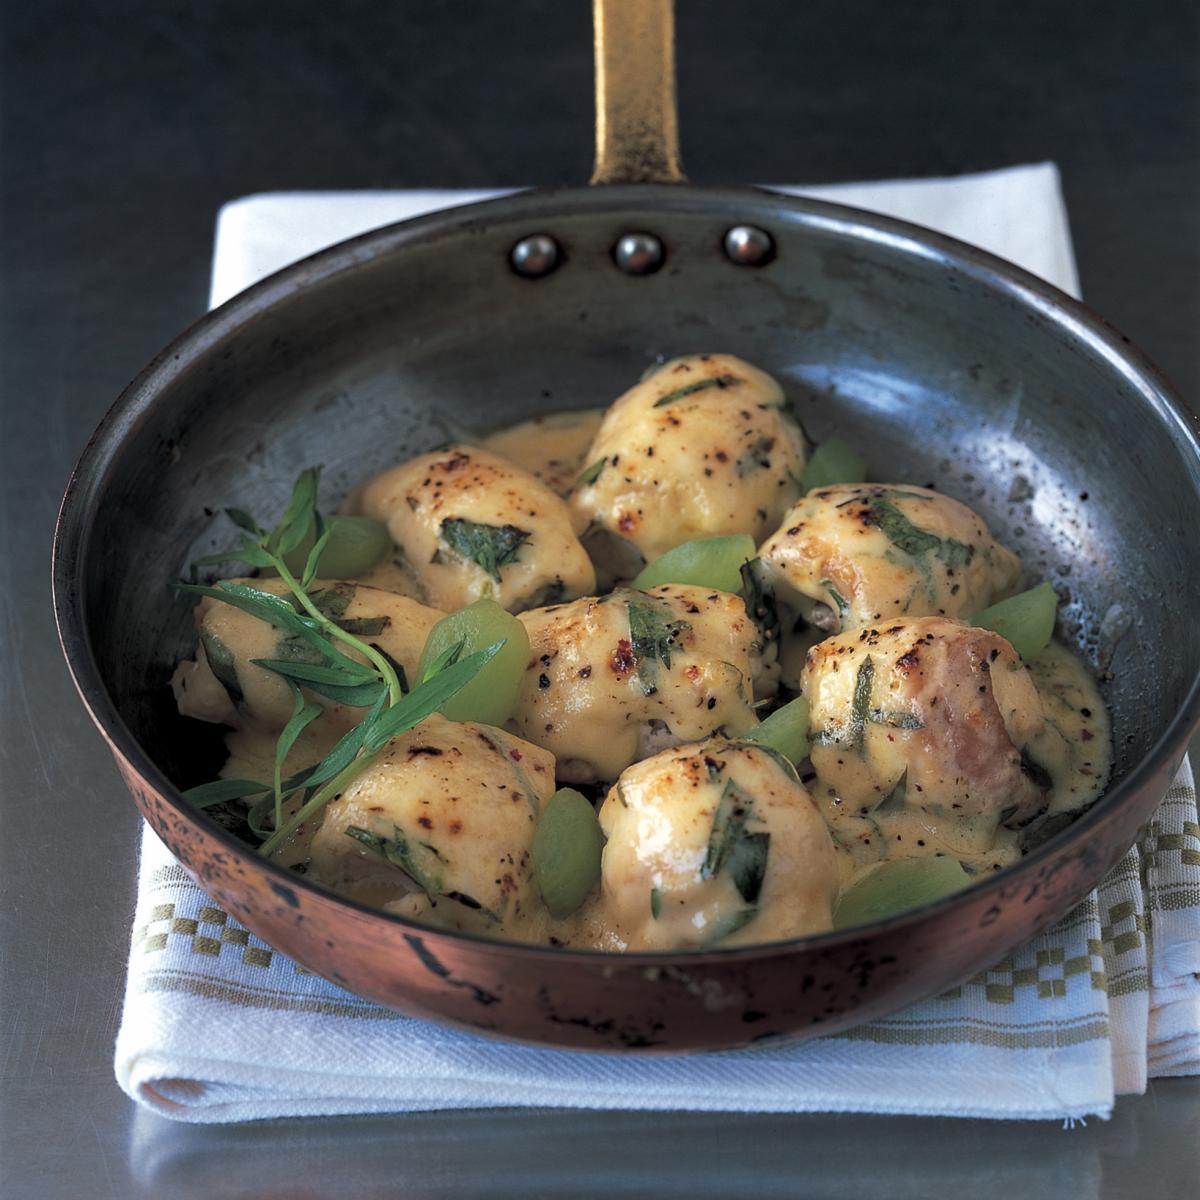 Fillets of sole vronique recipes delia online fish fillets of sole veronique forumfinder Image collections